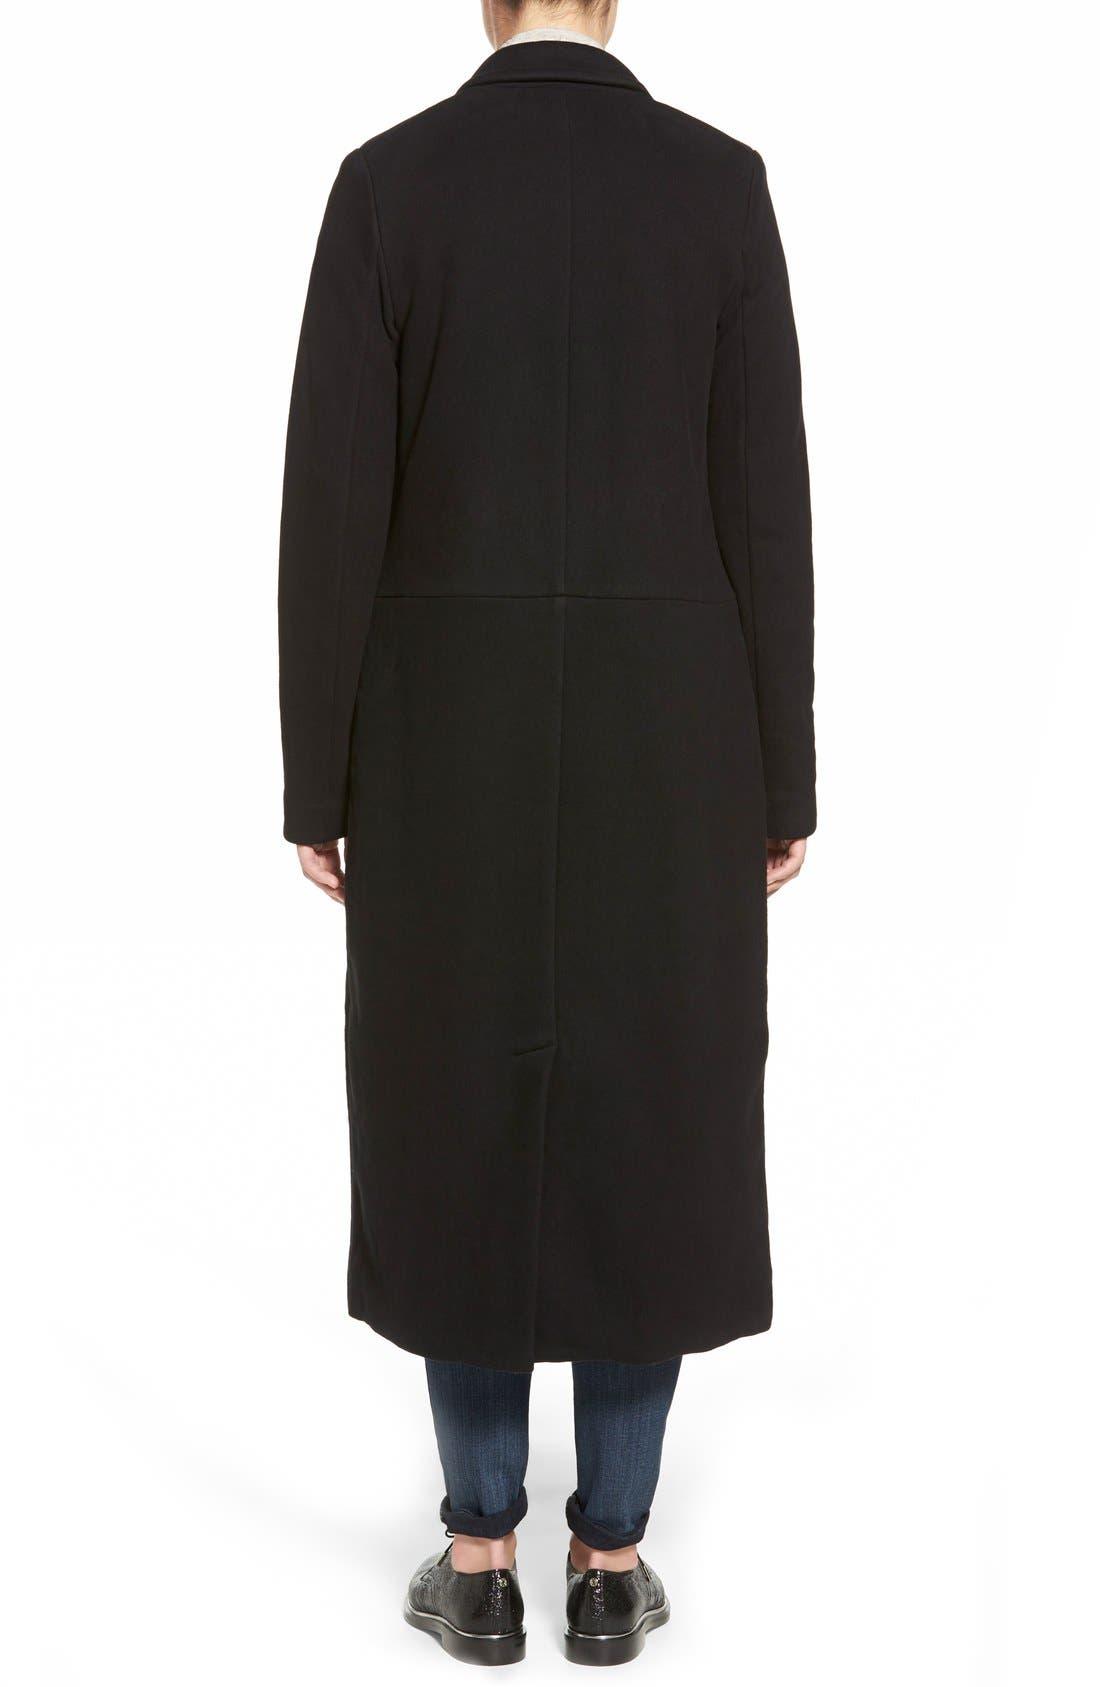 JAMES PERSE,                             Fleece Overcoat,                             Alternate thumbnail 3, color,                             001